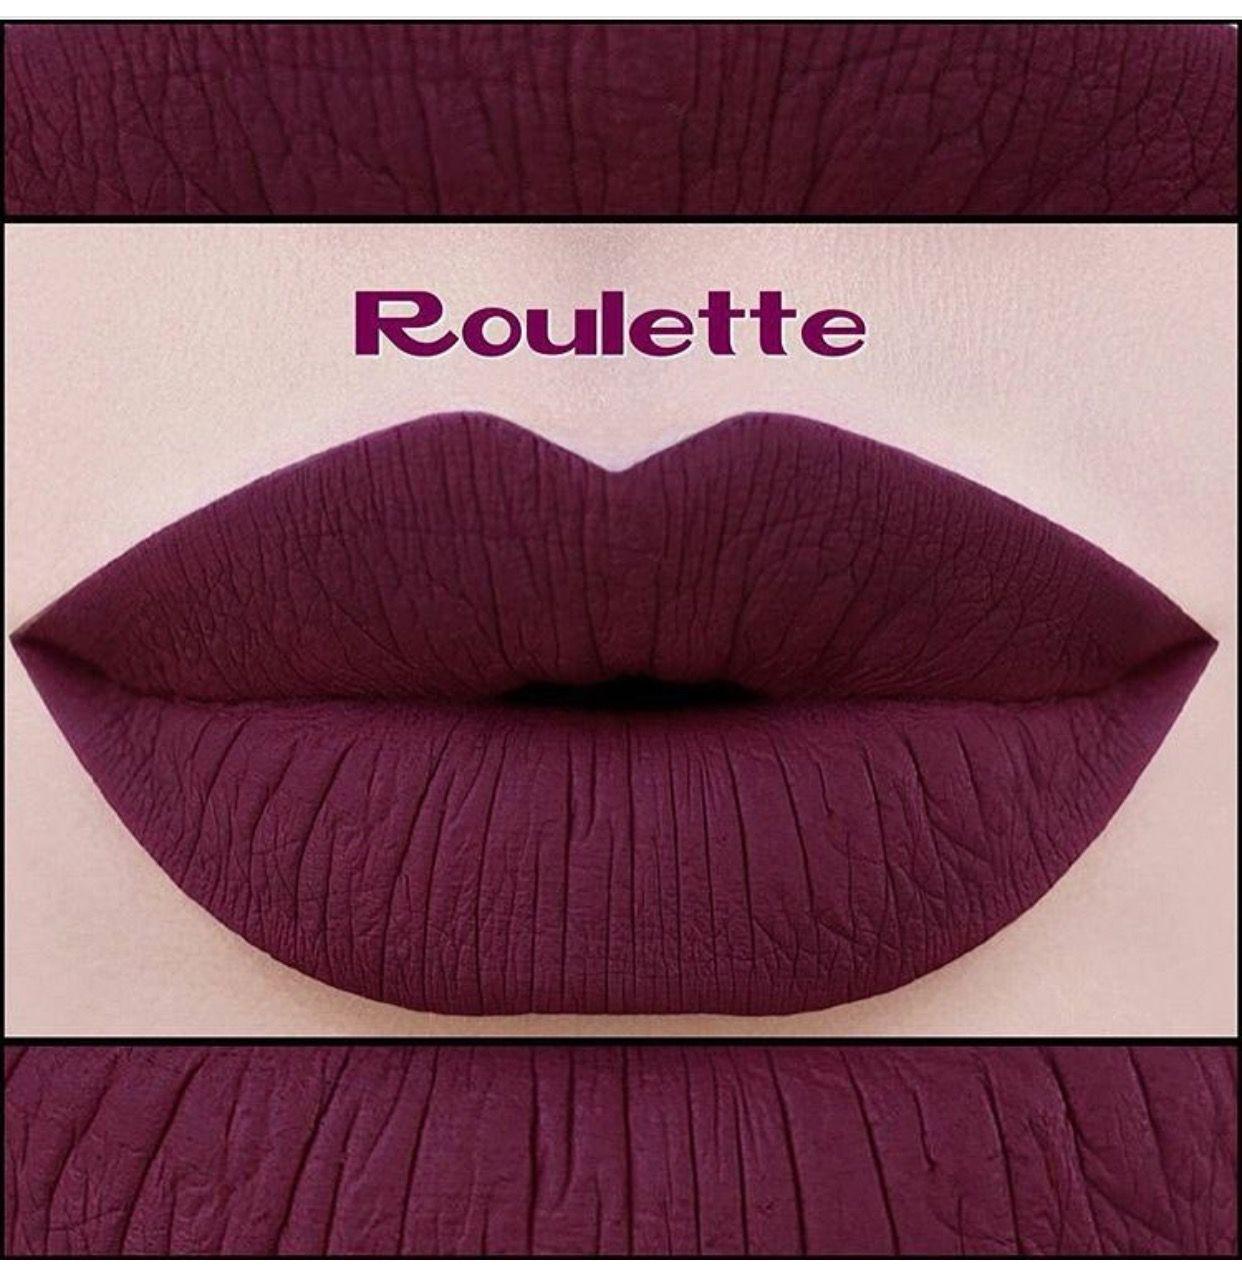 depechegurlRepost from @colouredraine .. 'Roulette' Another new shade.